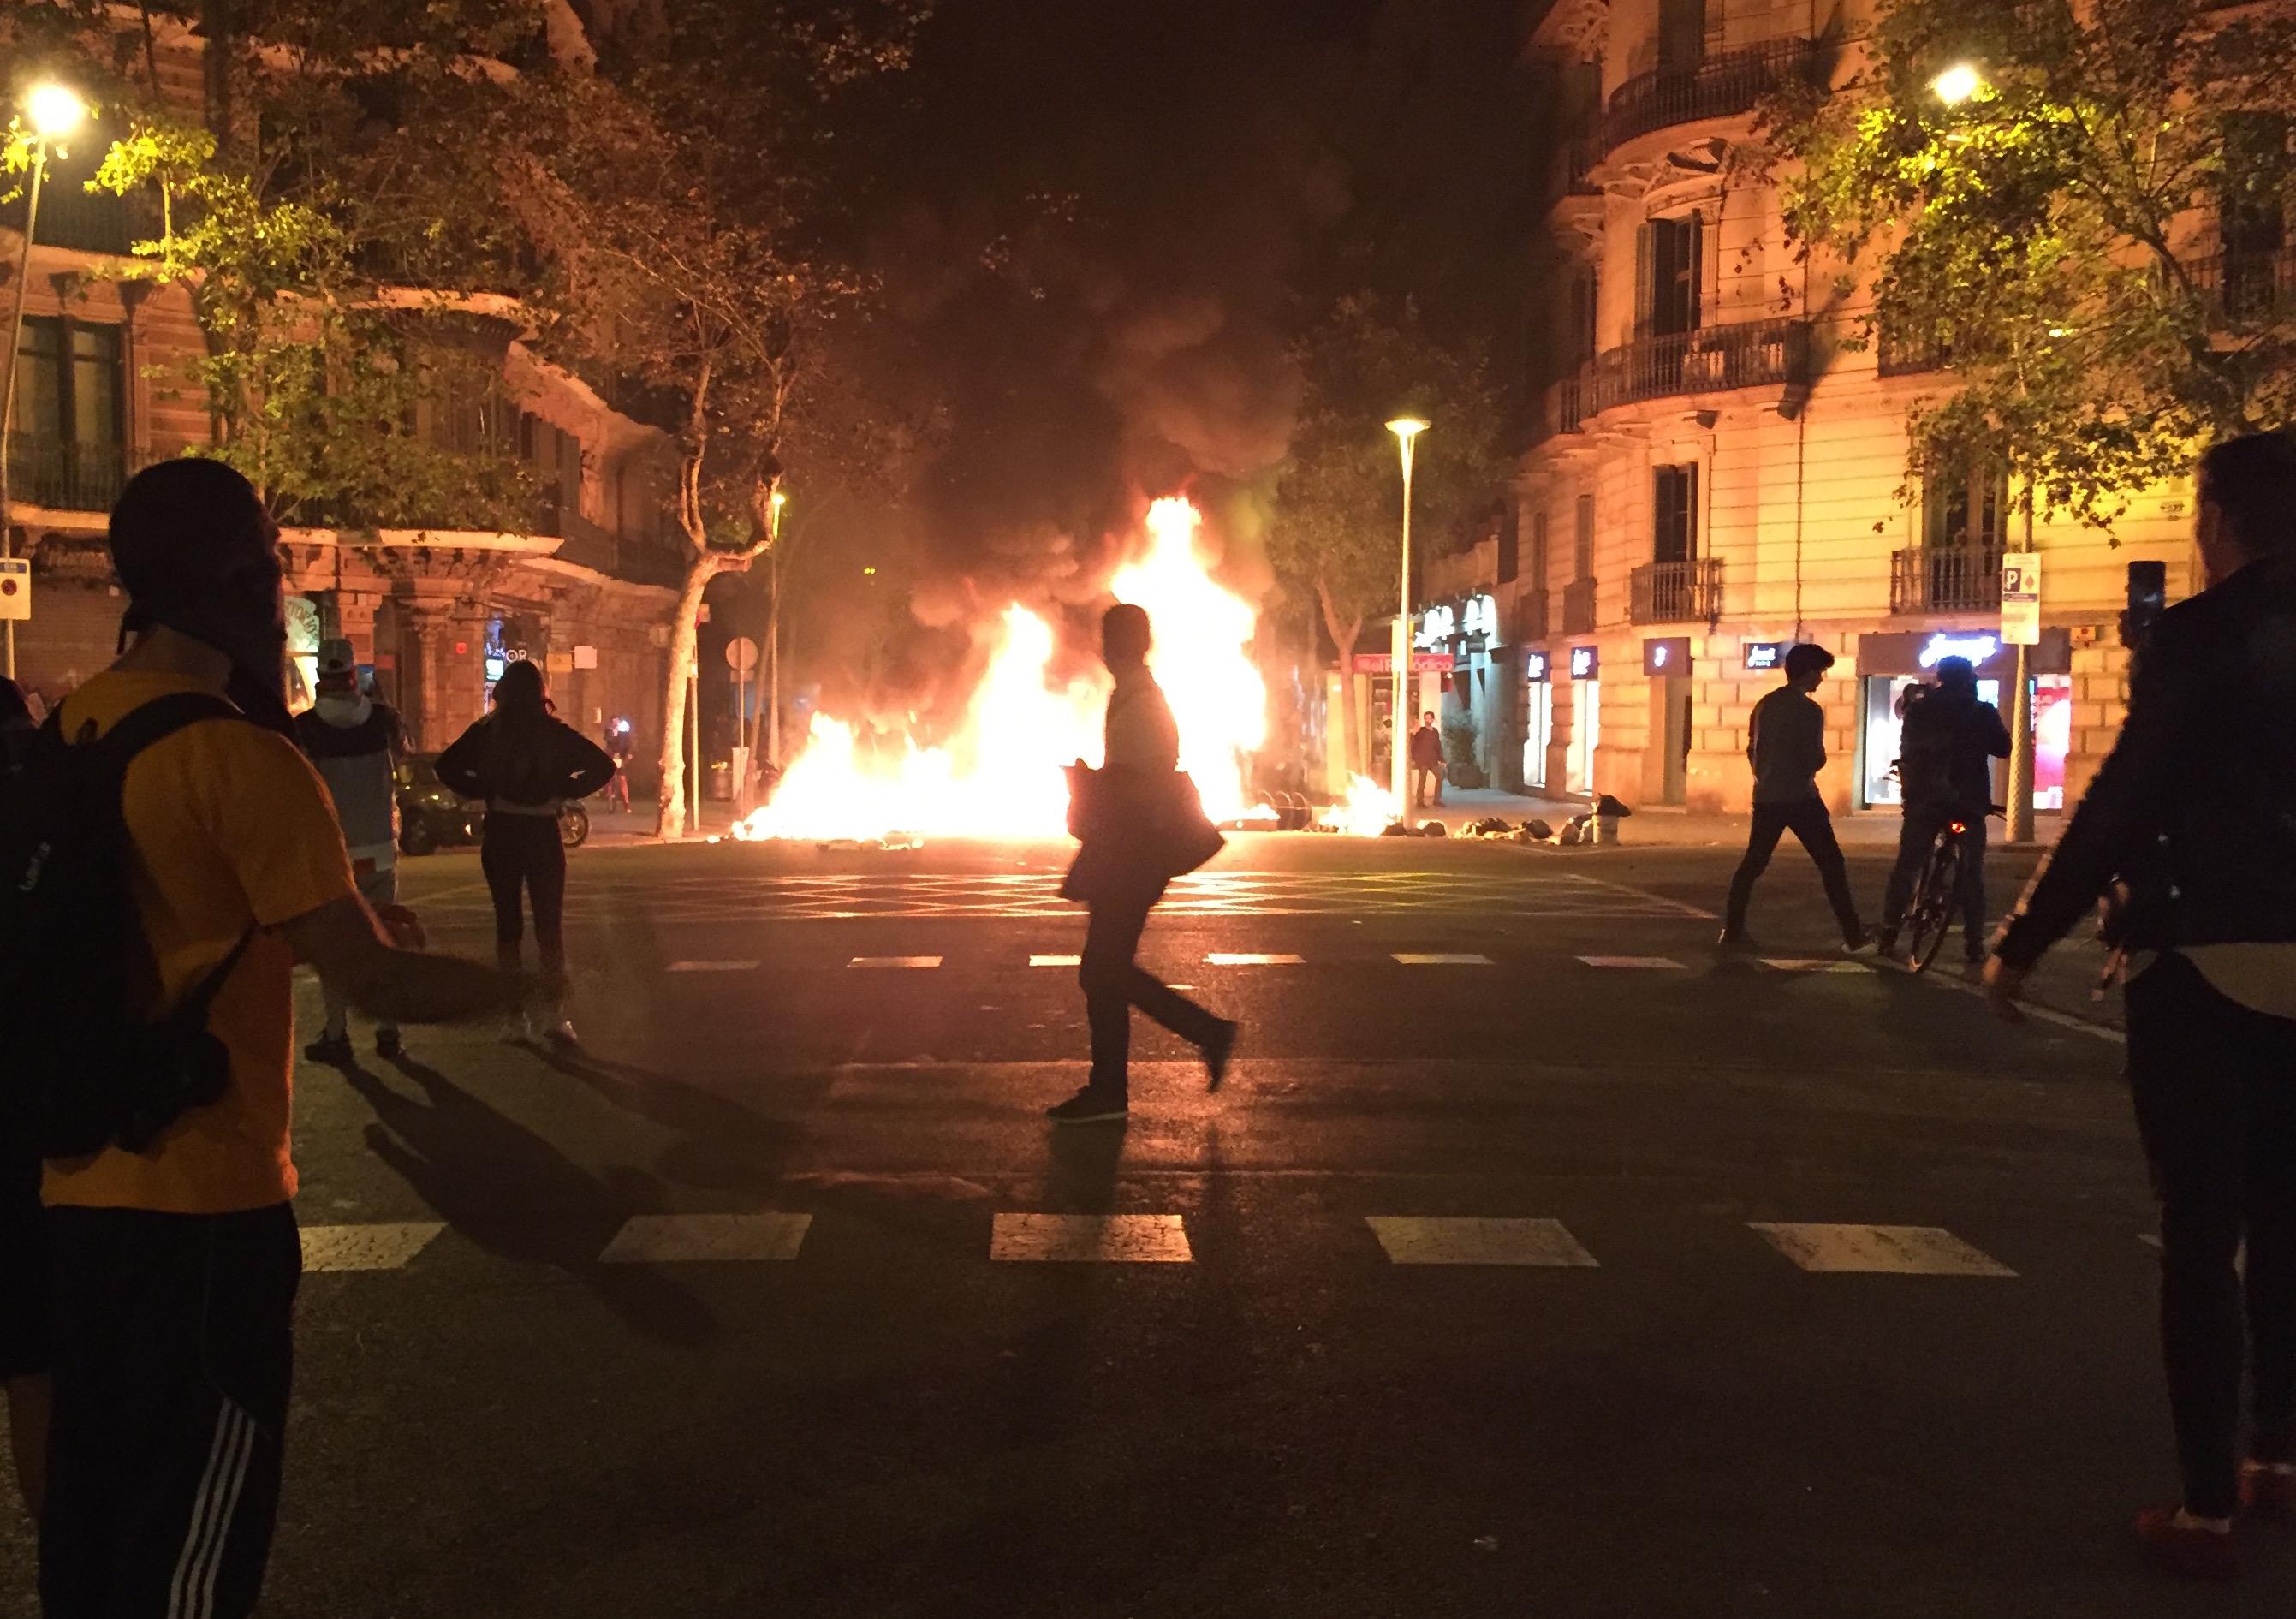 Barcelona Fire Edited